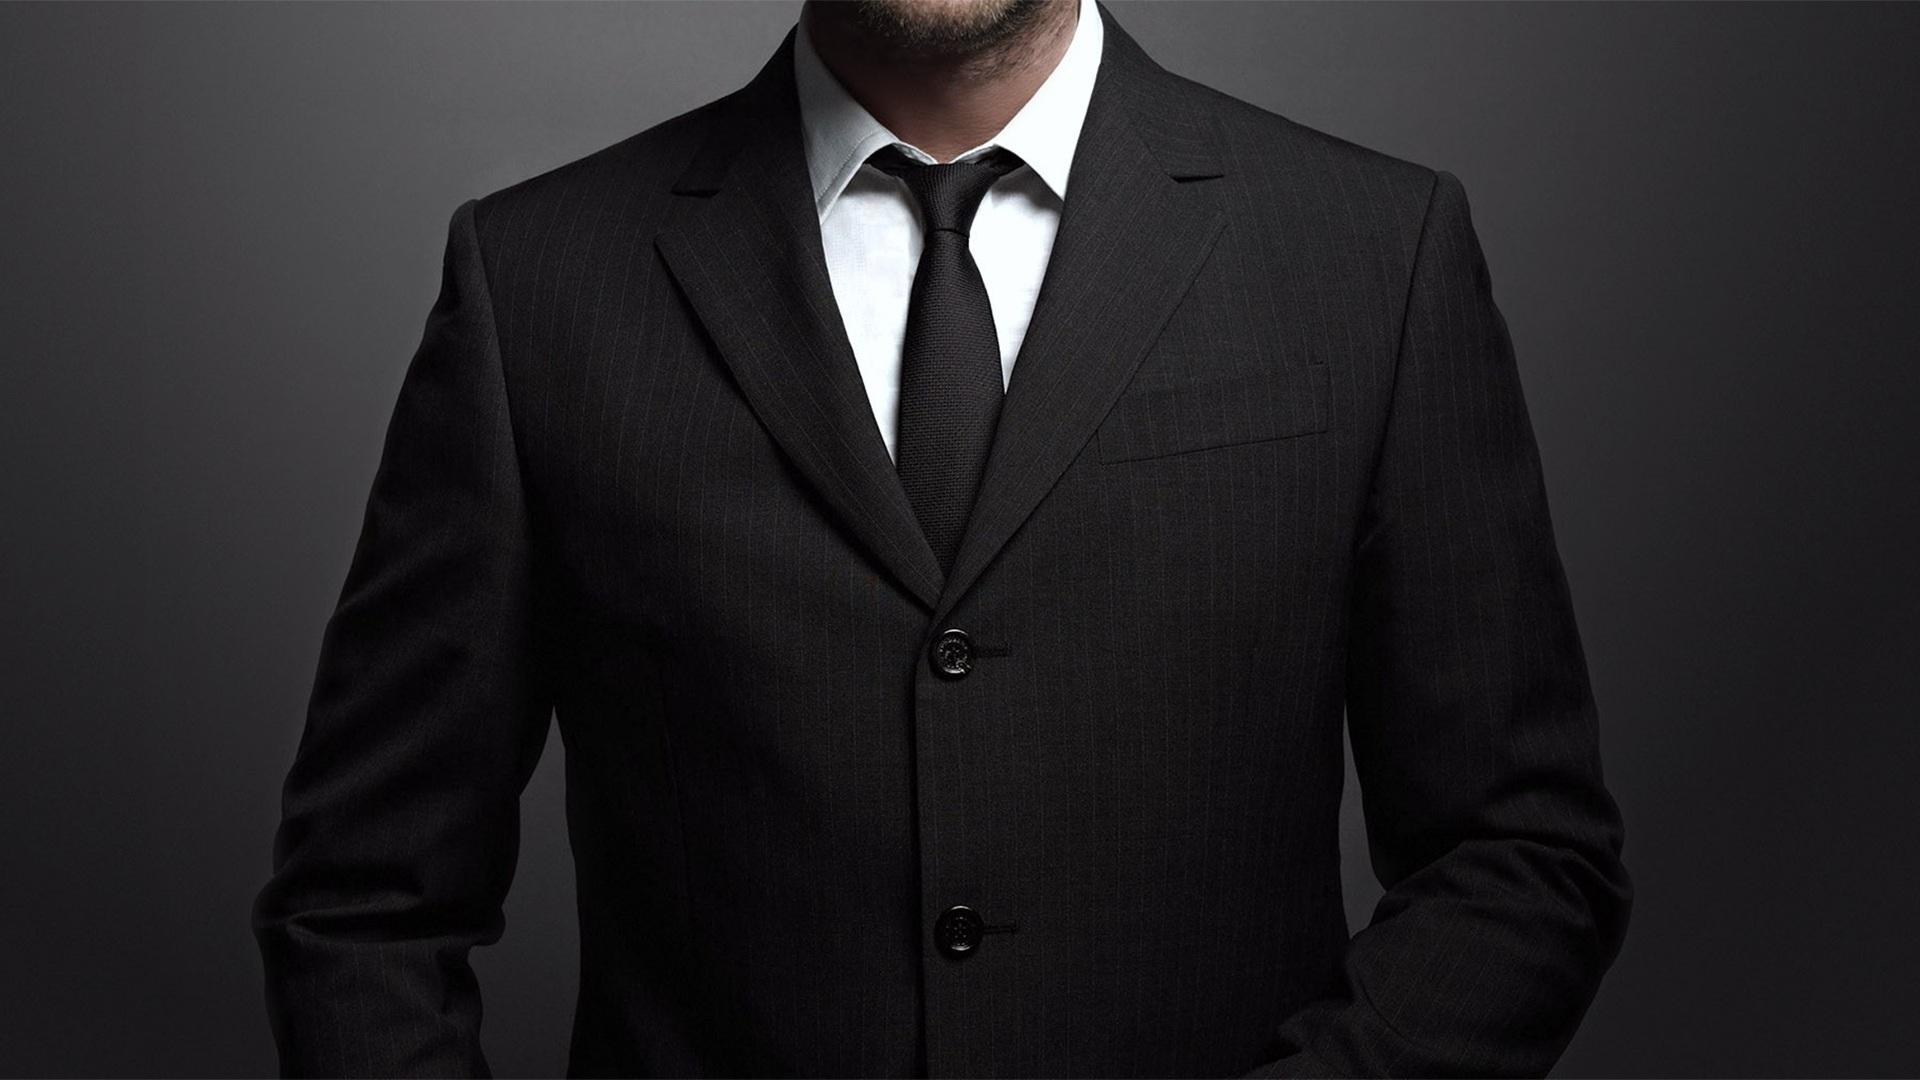 بالصور صور بدل رجالي , اجمل ما يلبسه الرجال من بدلات 6667 1